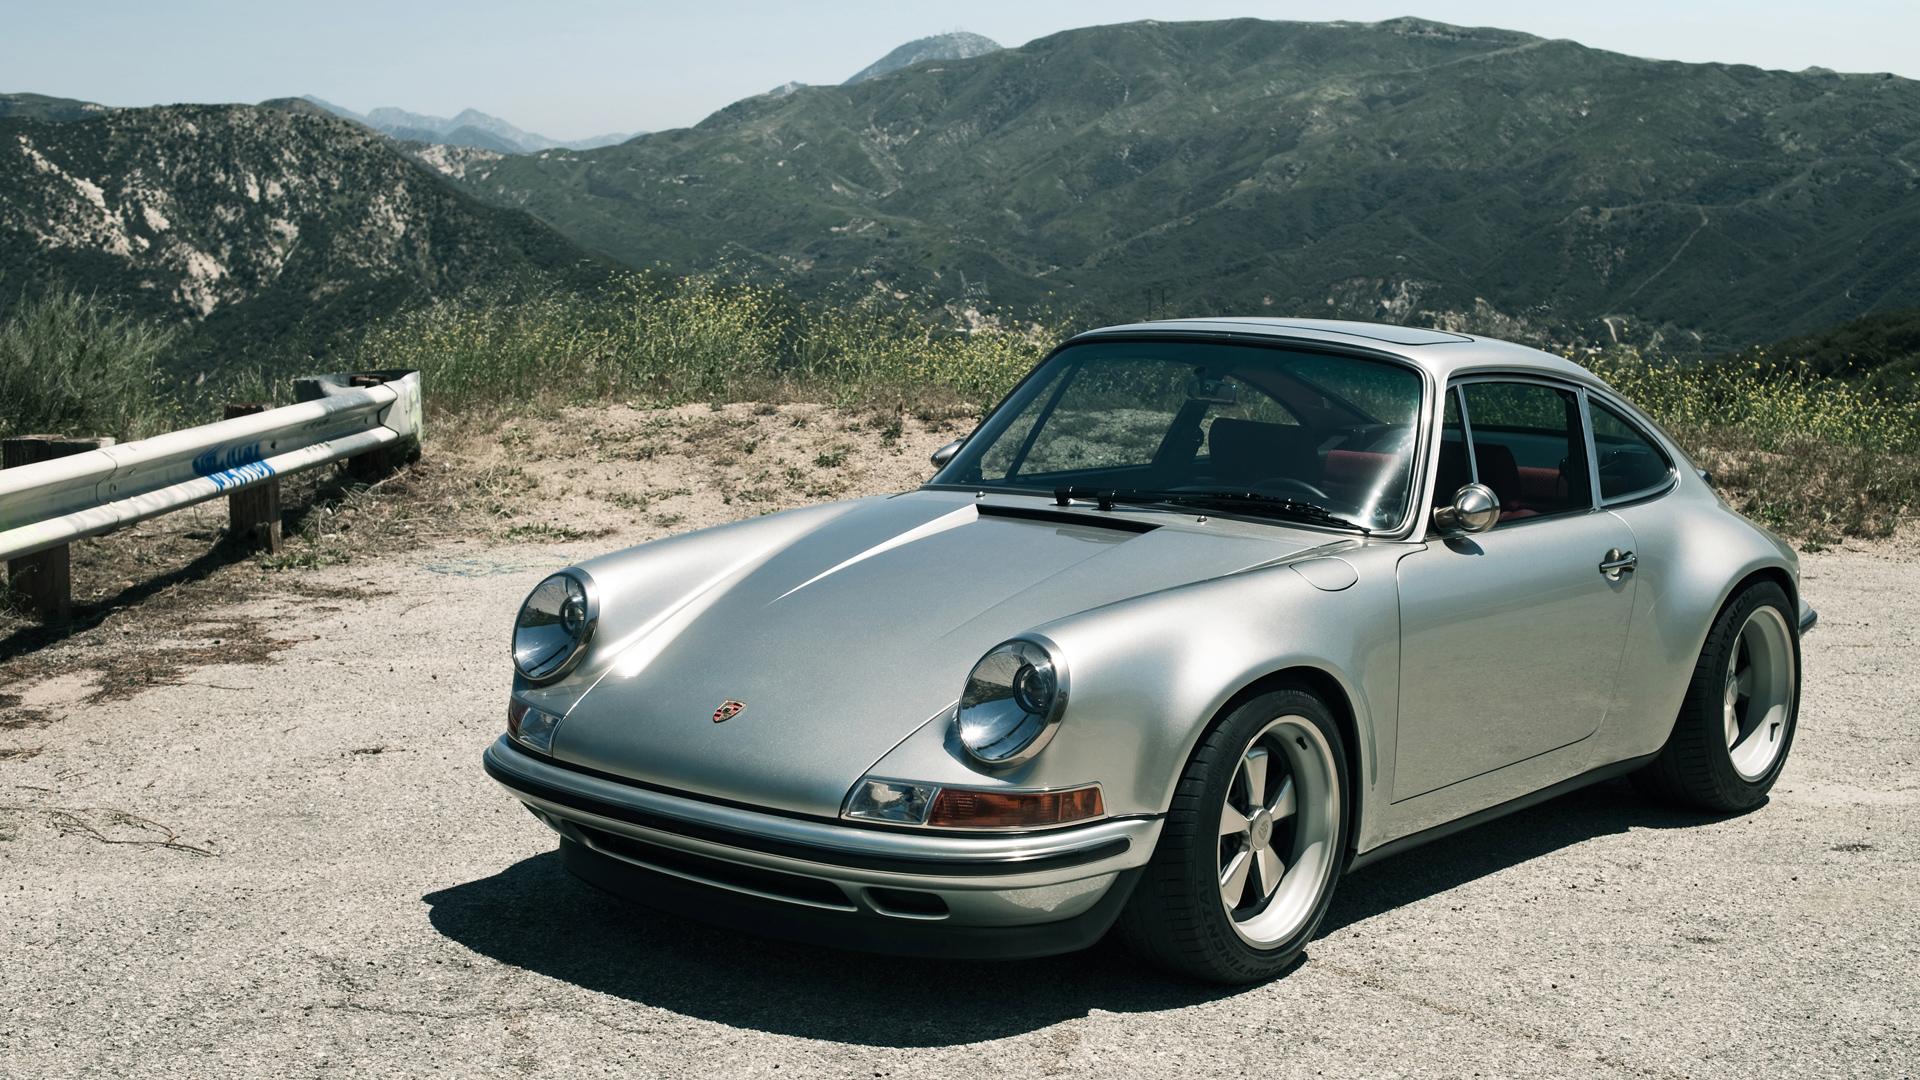 Porsche 911 Classic Wallpaper HD Car Wallpapers 1920x1080